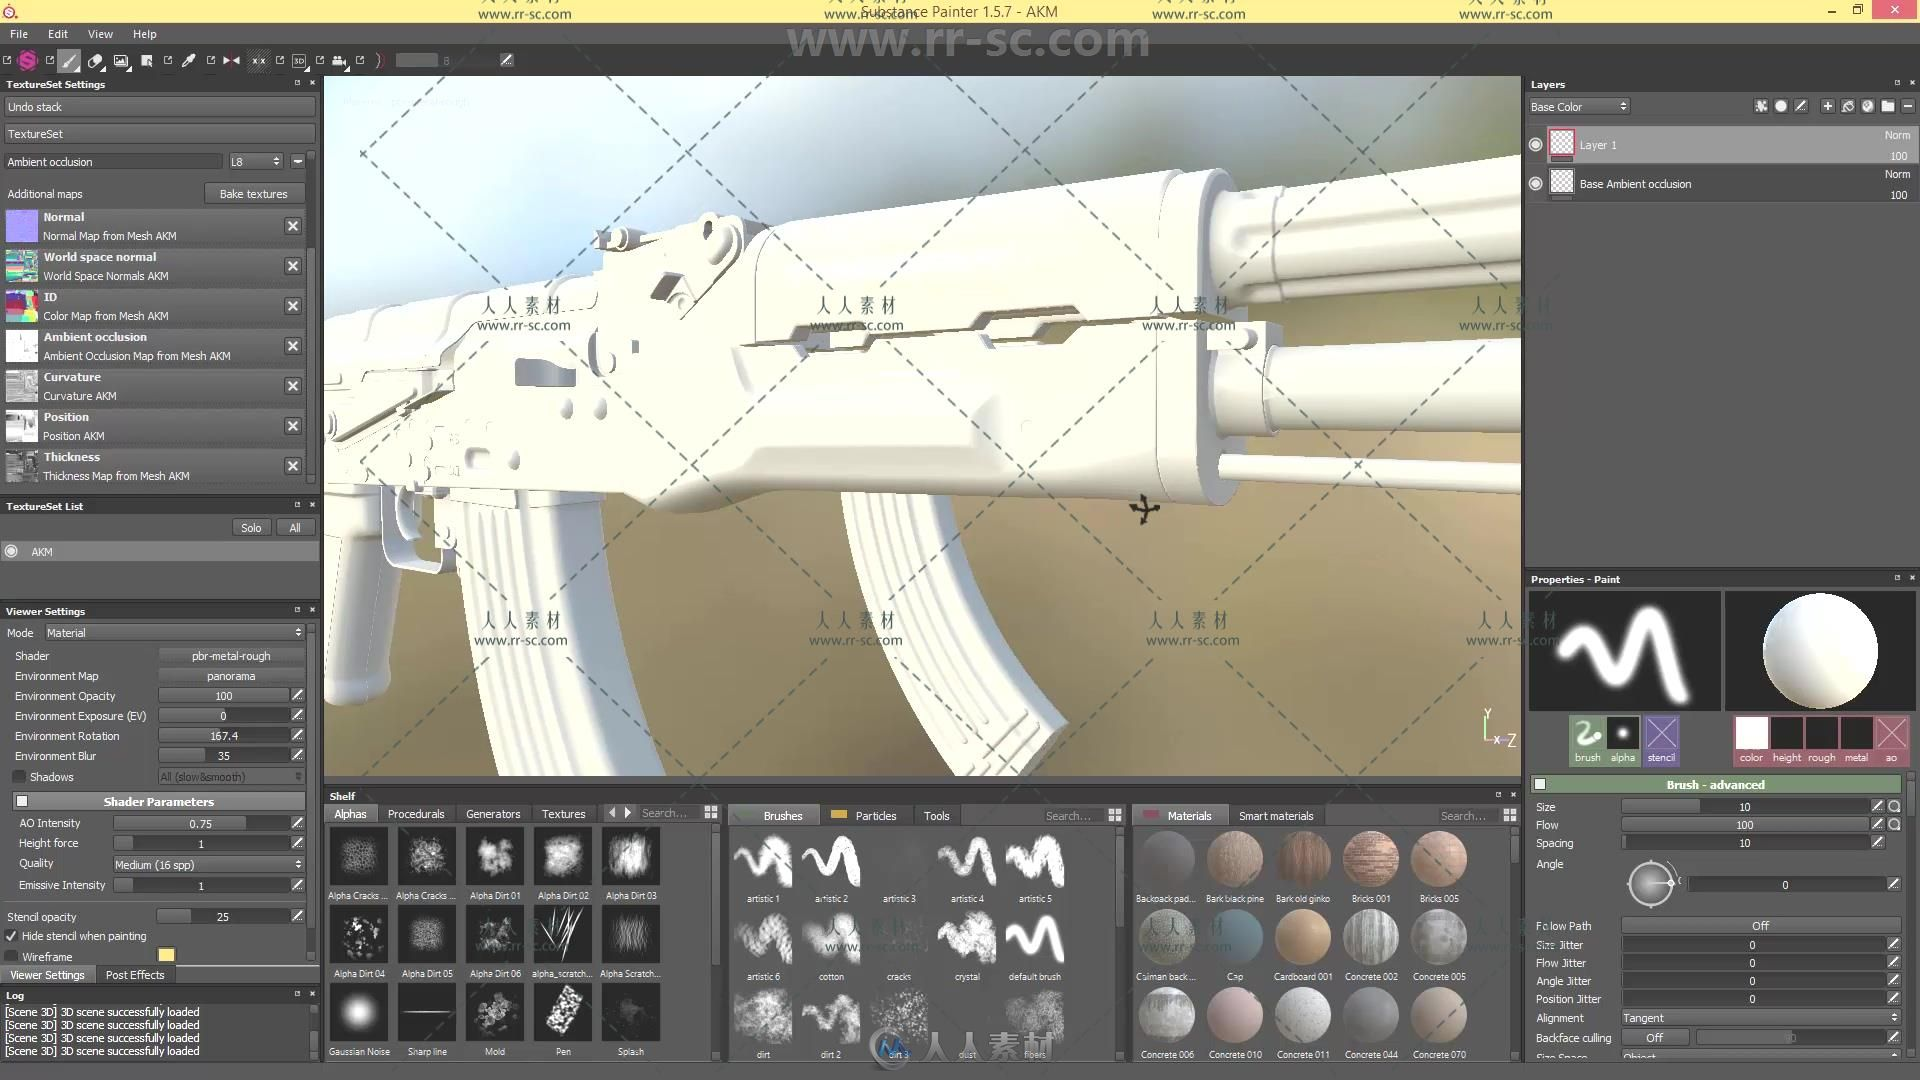 SubstancePainter游戏纹理视频v纹理武器教程ag600视频图片